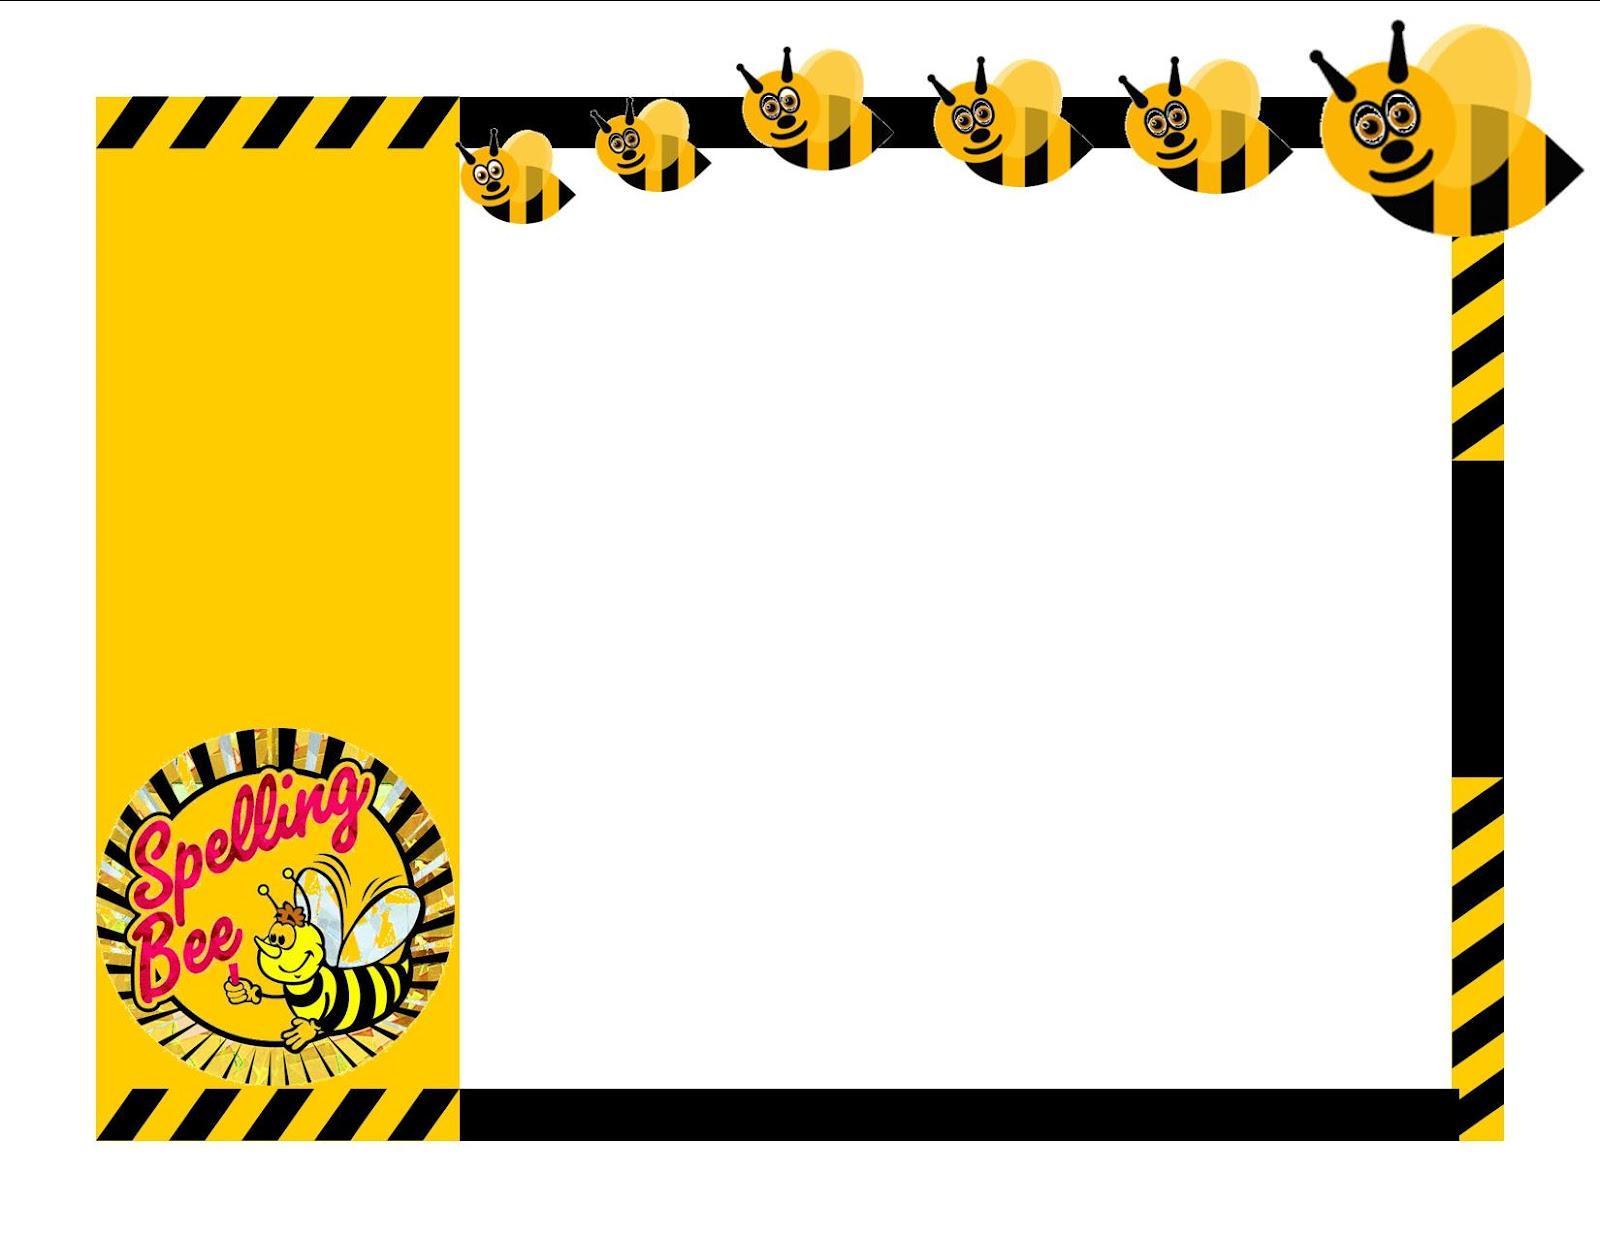 Spelling bee clip art 6